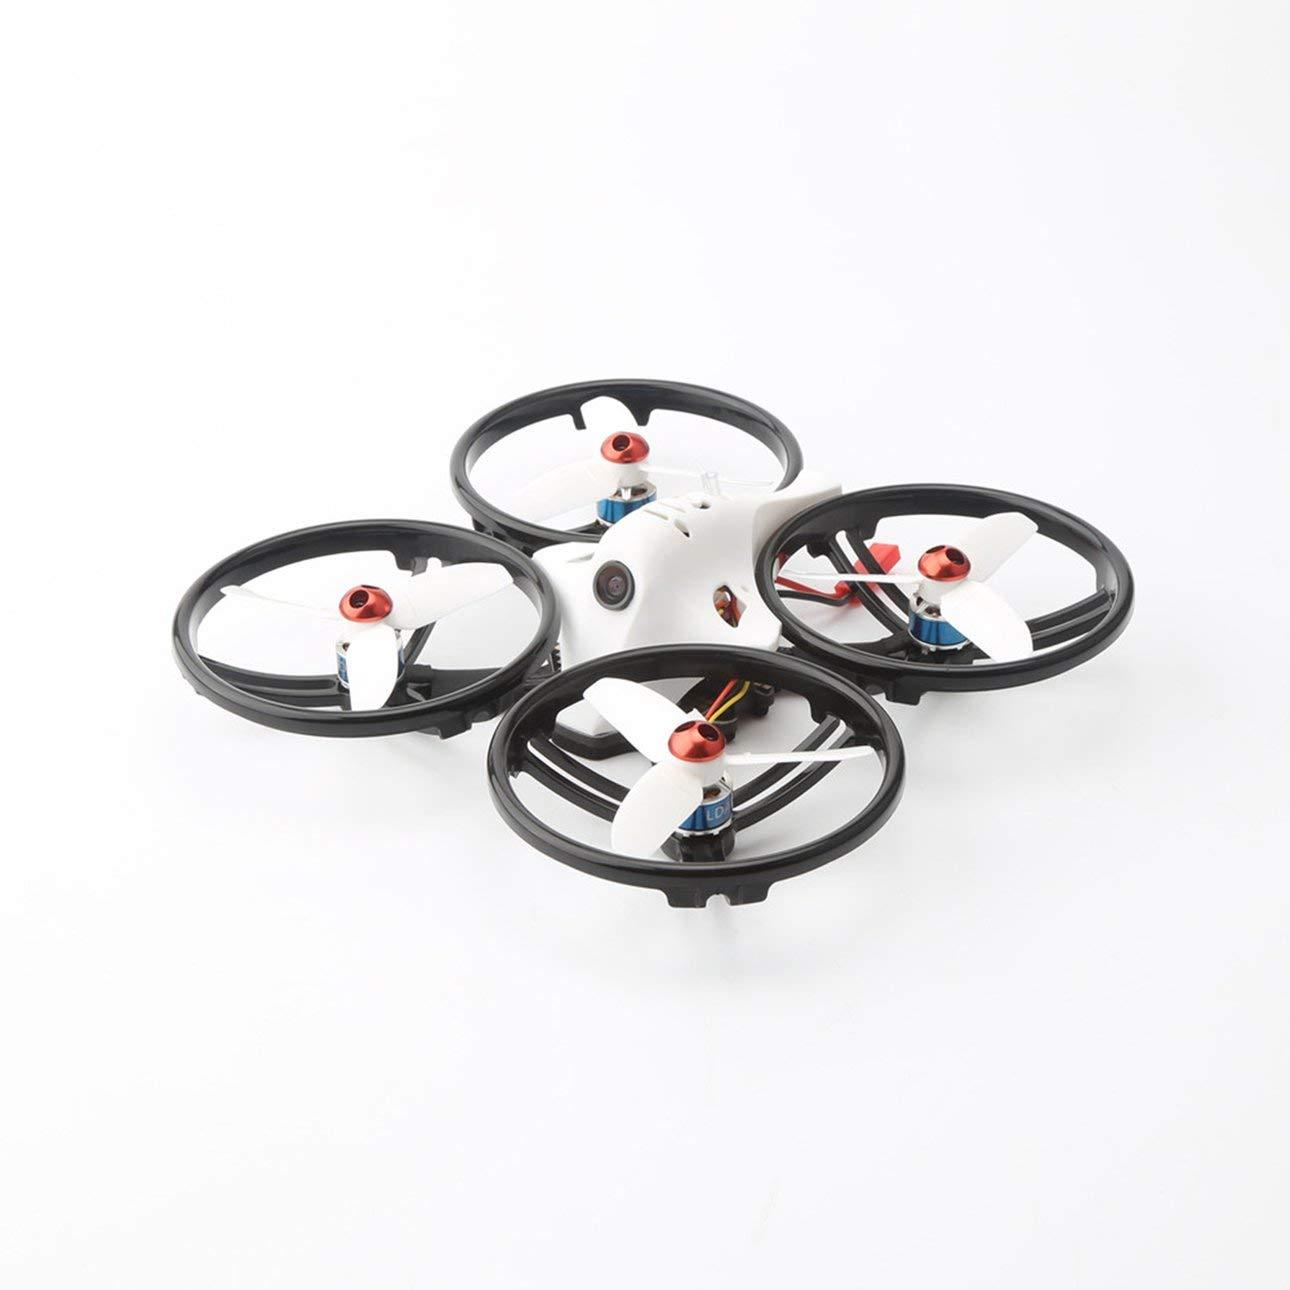 Drohne mit Kamera LDARC ET125 V2 5.8G Brushless OSD Kamera Mini FPV RC Racing Drone PNP Version von Ballylyly